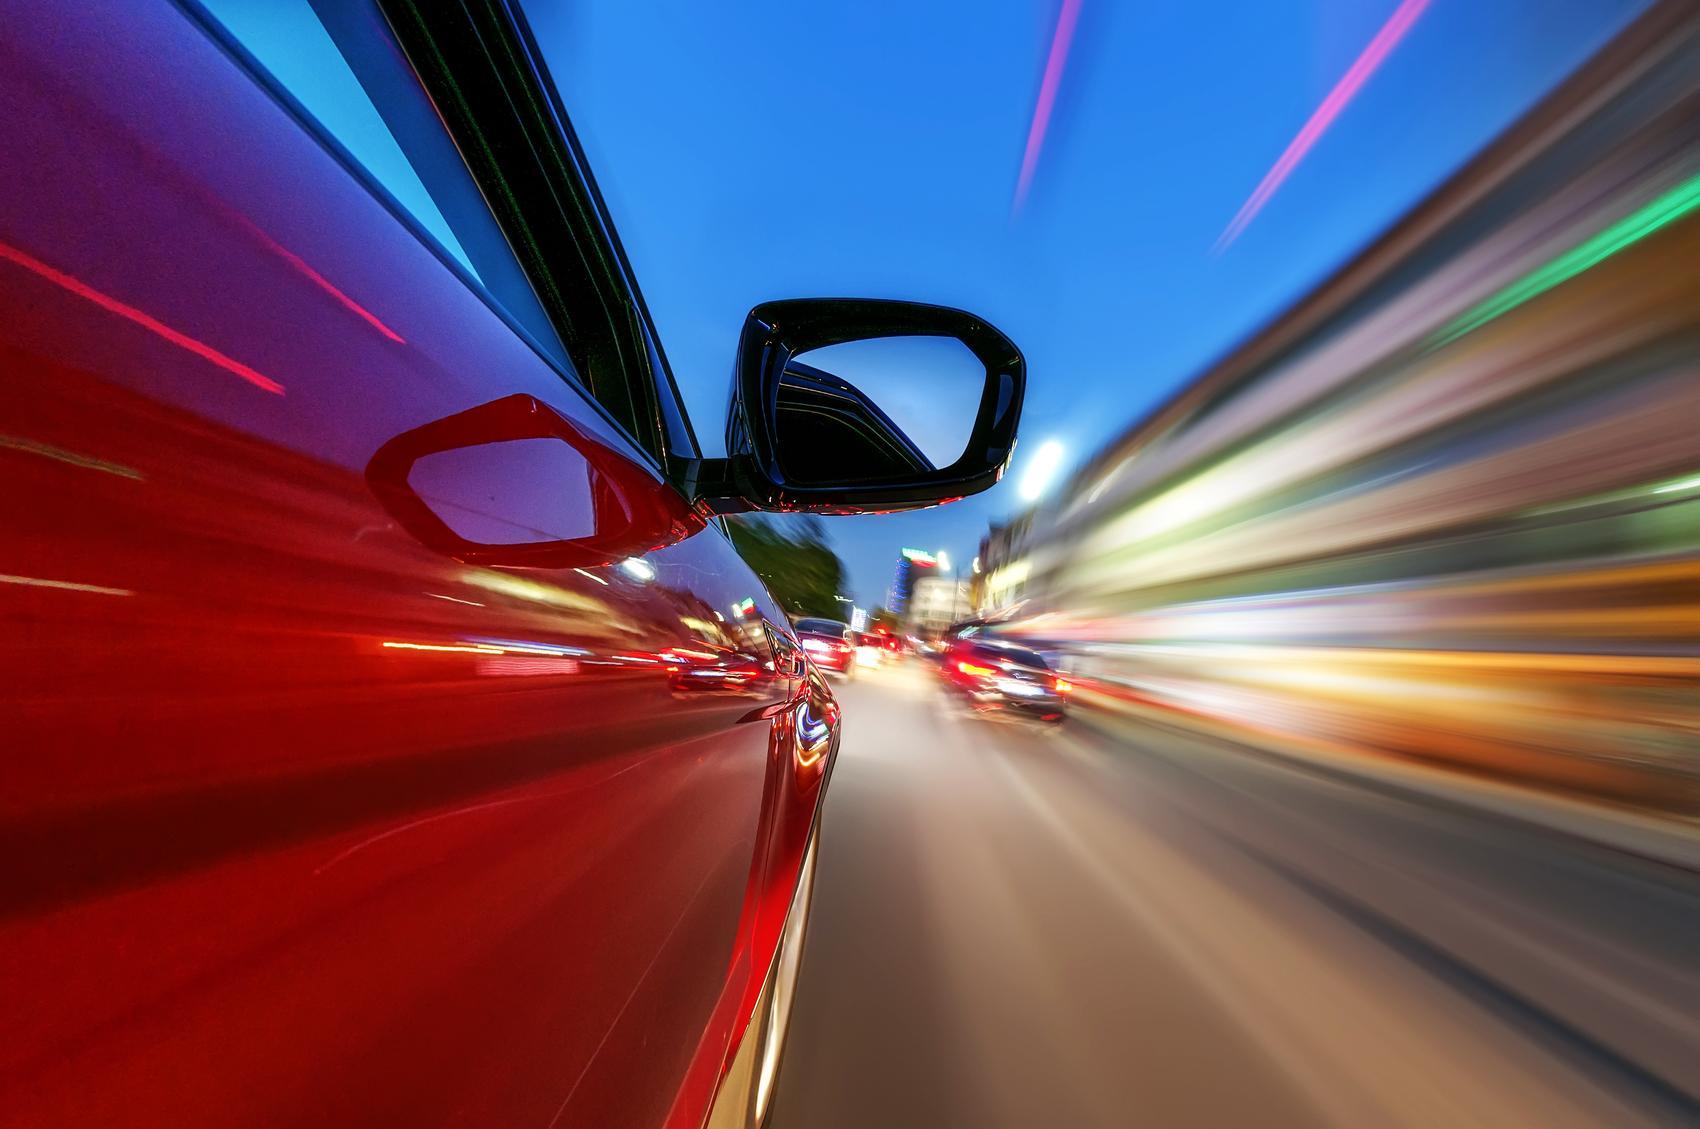 img_why_a_car_jerks_when_accelerating_11142_orig.jpg